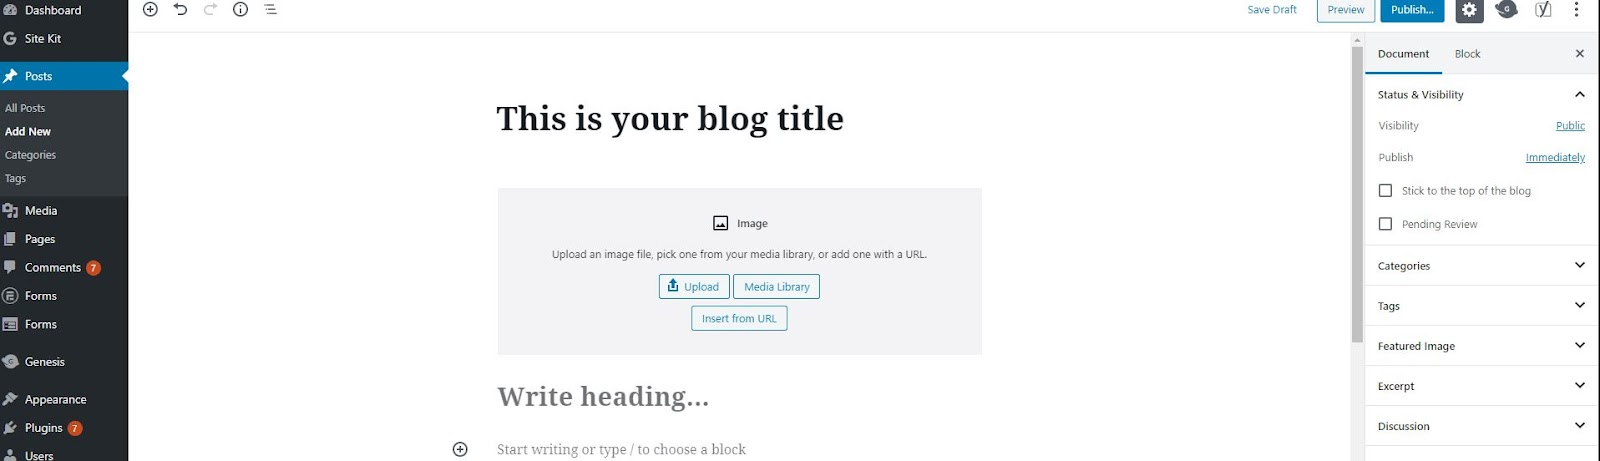 WordPress' blogging platform